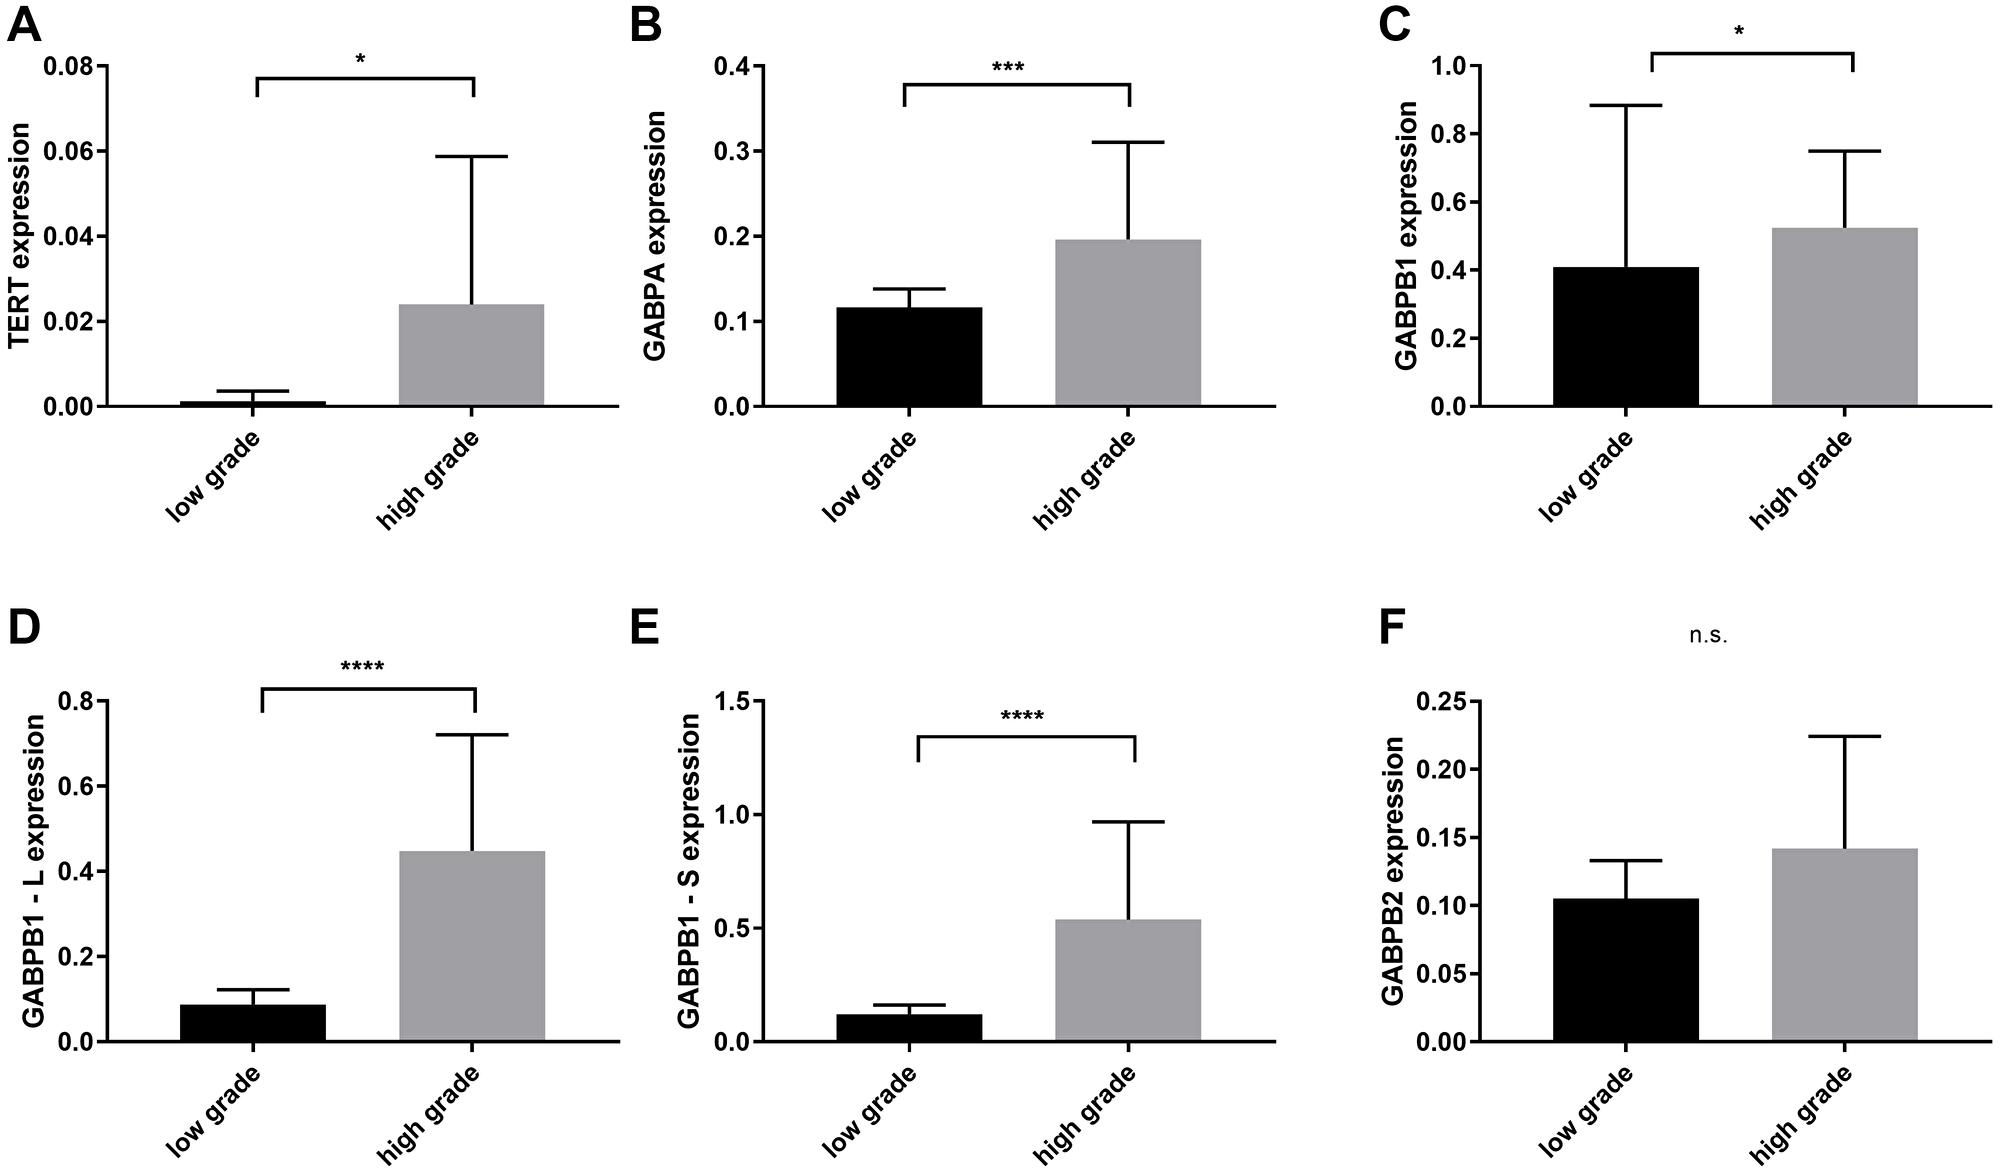 Comparison of TERT, GAPBA, GAPB1, GABPB1–L, GABPB1–S and GABPB2 mRNA expression levels between low grade (WHO II) and high grade gliomas (WHO III and secondary glioblastomas).